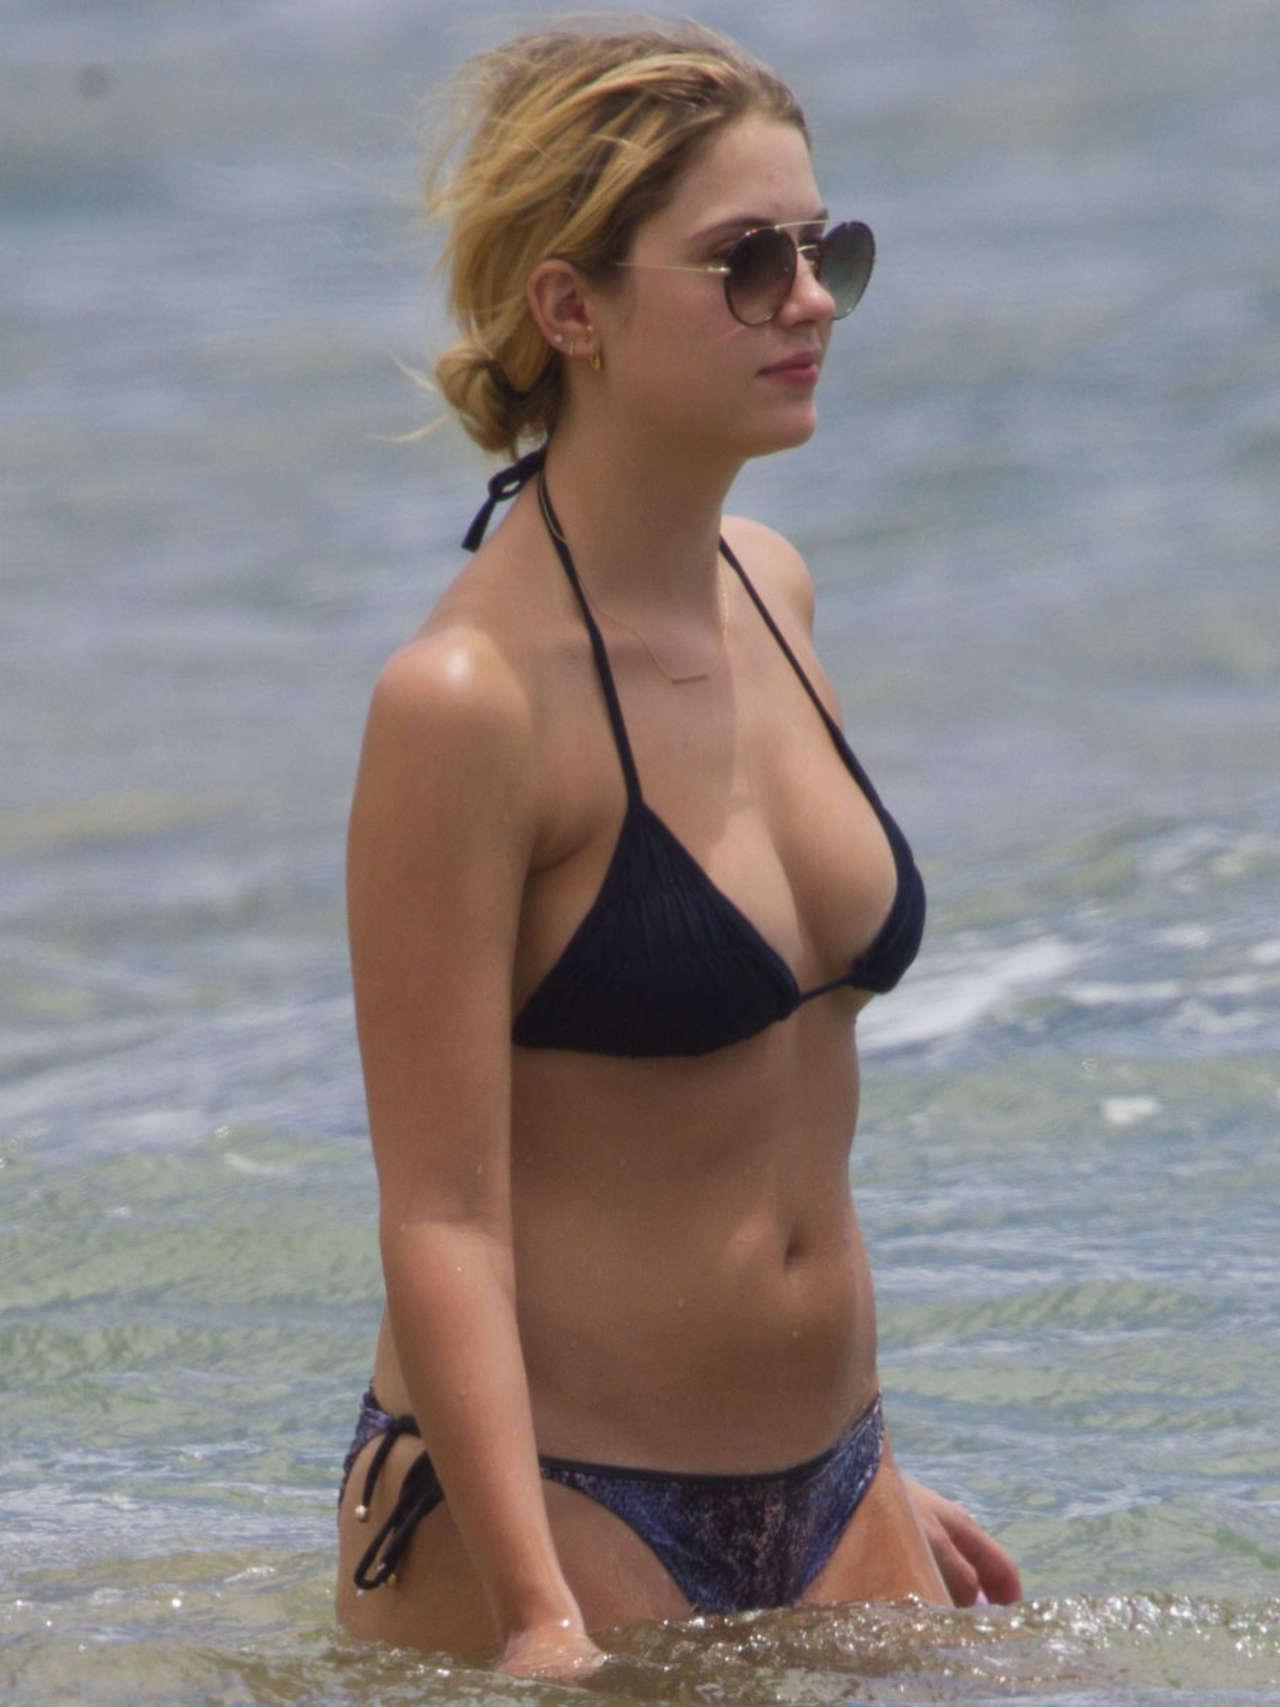 Ashley Benson 2014 : Ashley Benson and Shay Mitchell in Bikini -04